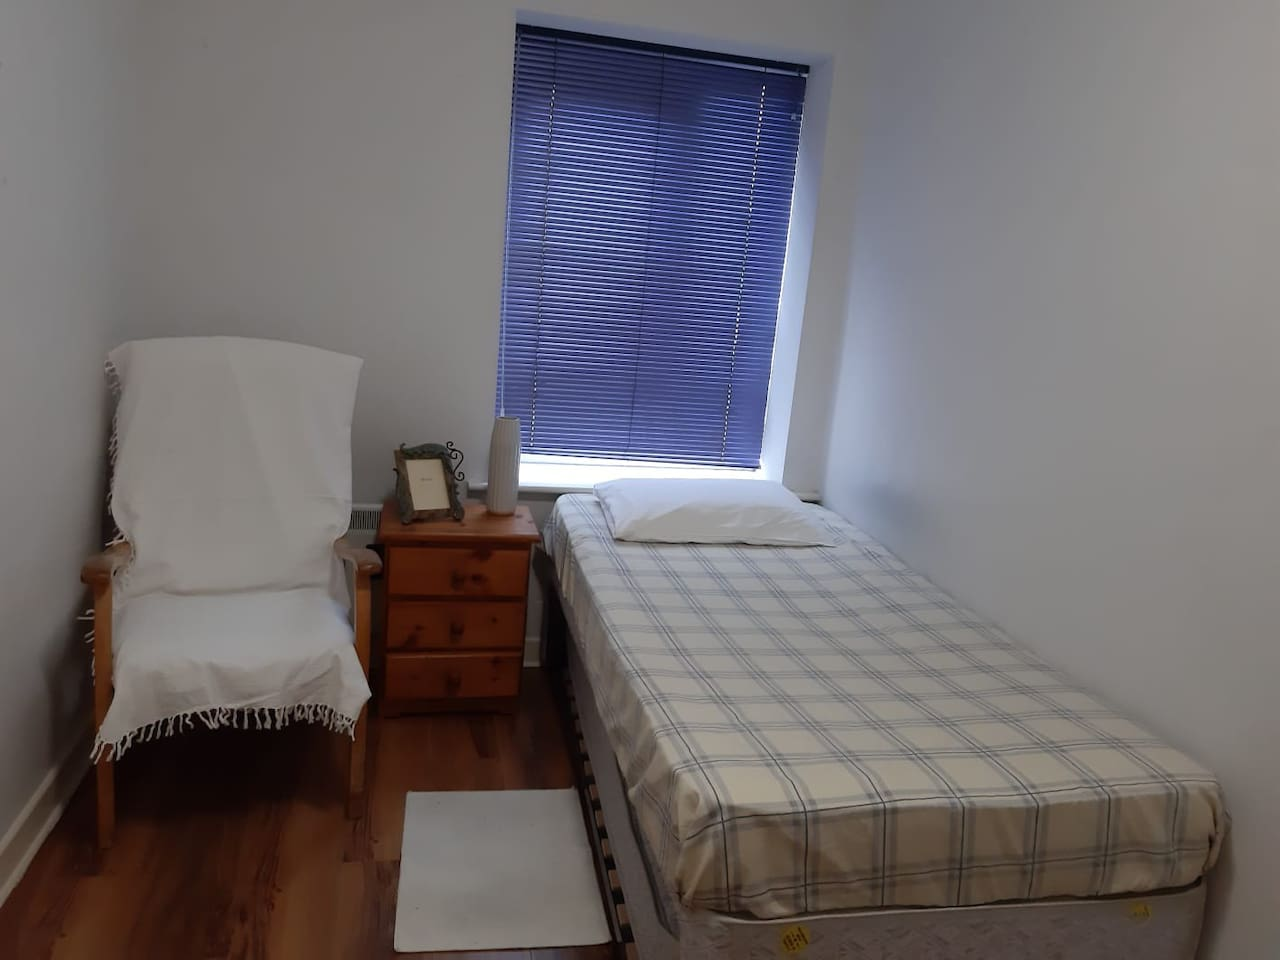 Single room 2 beds private bathroom free breakfast